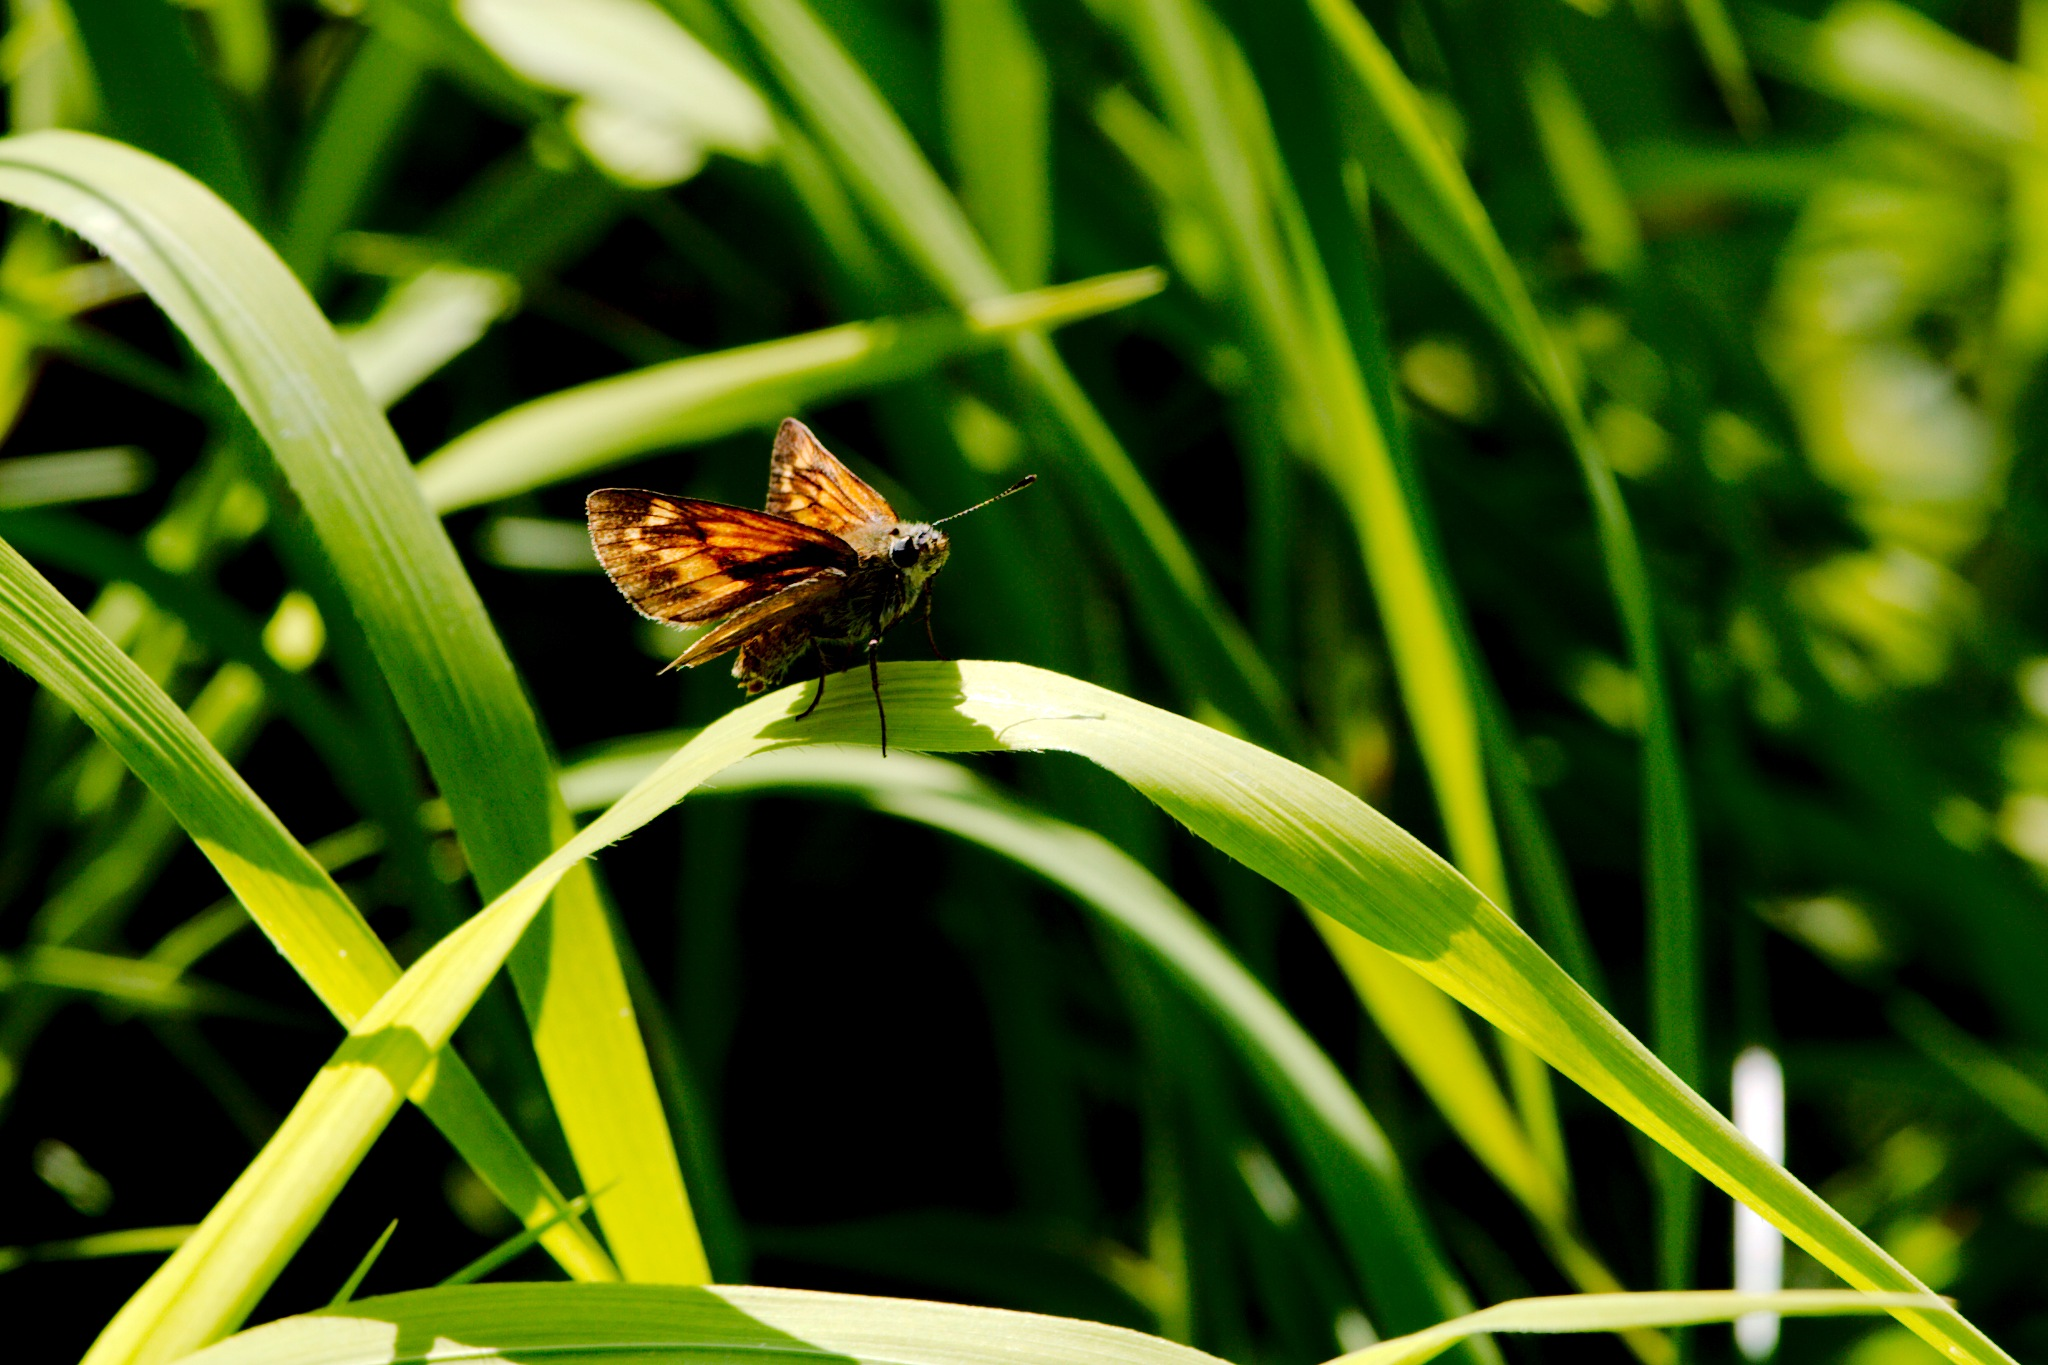 Schmetterling /butterfly by Rolf-Dieter Balindt